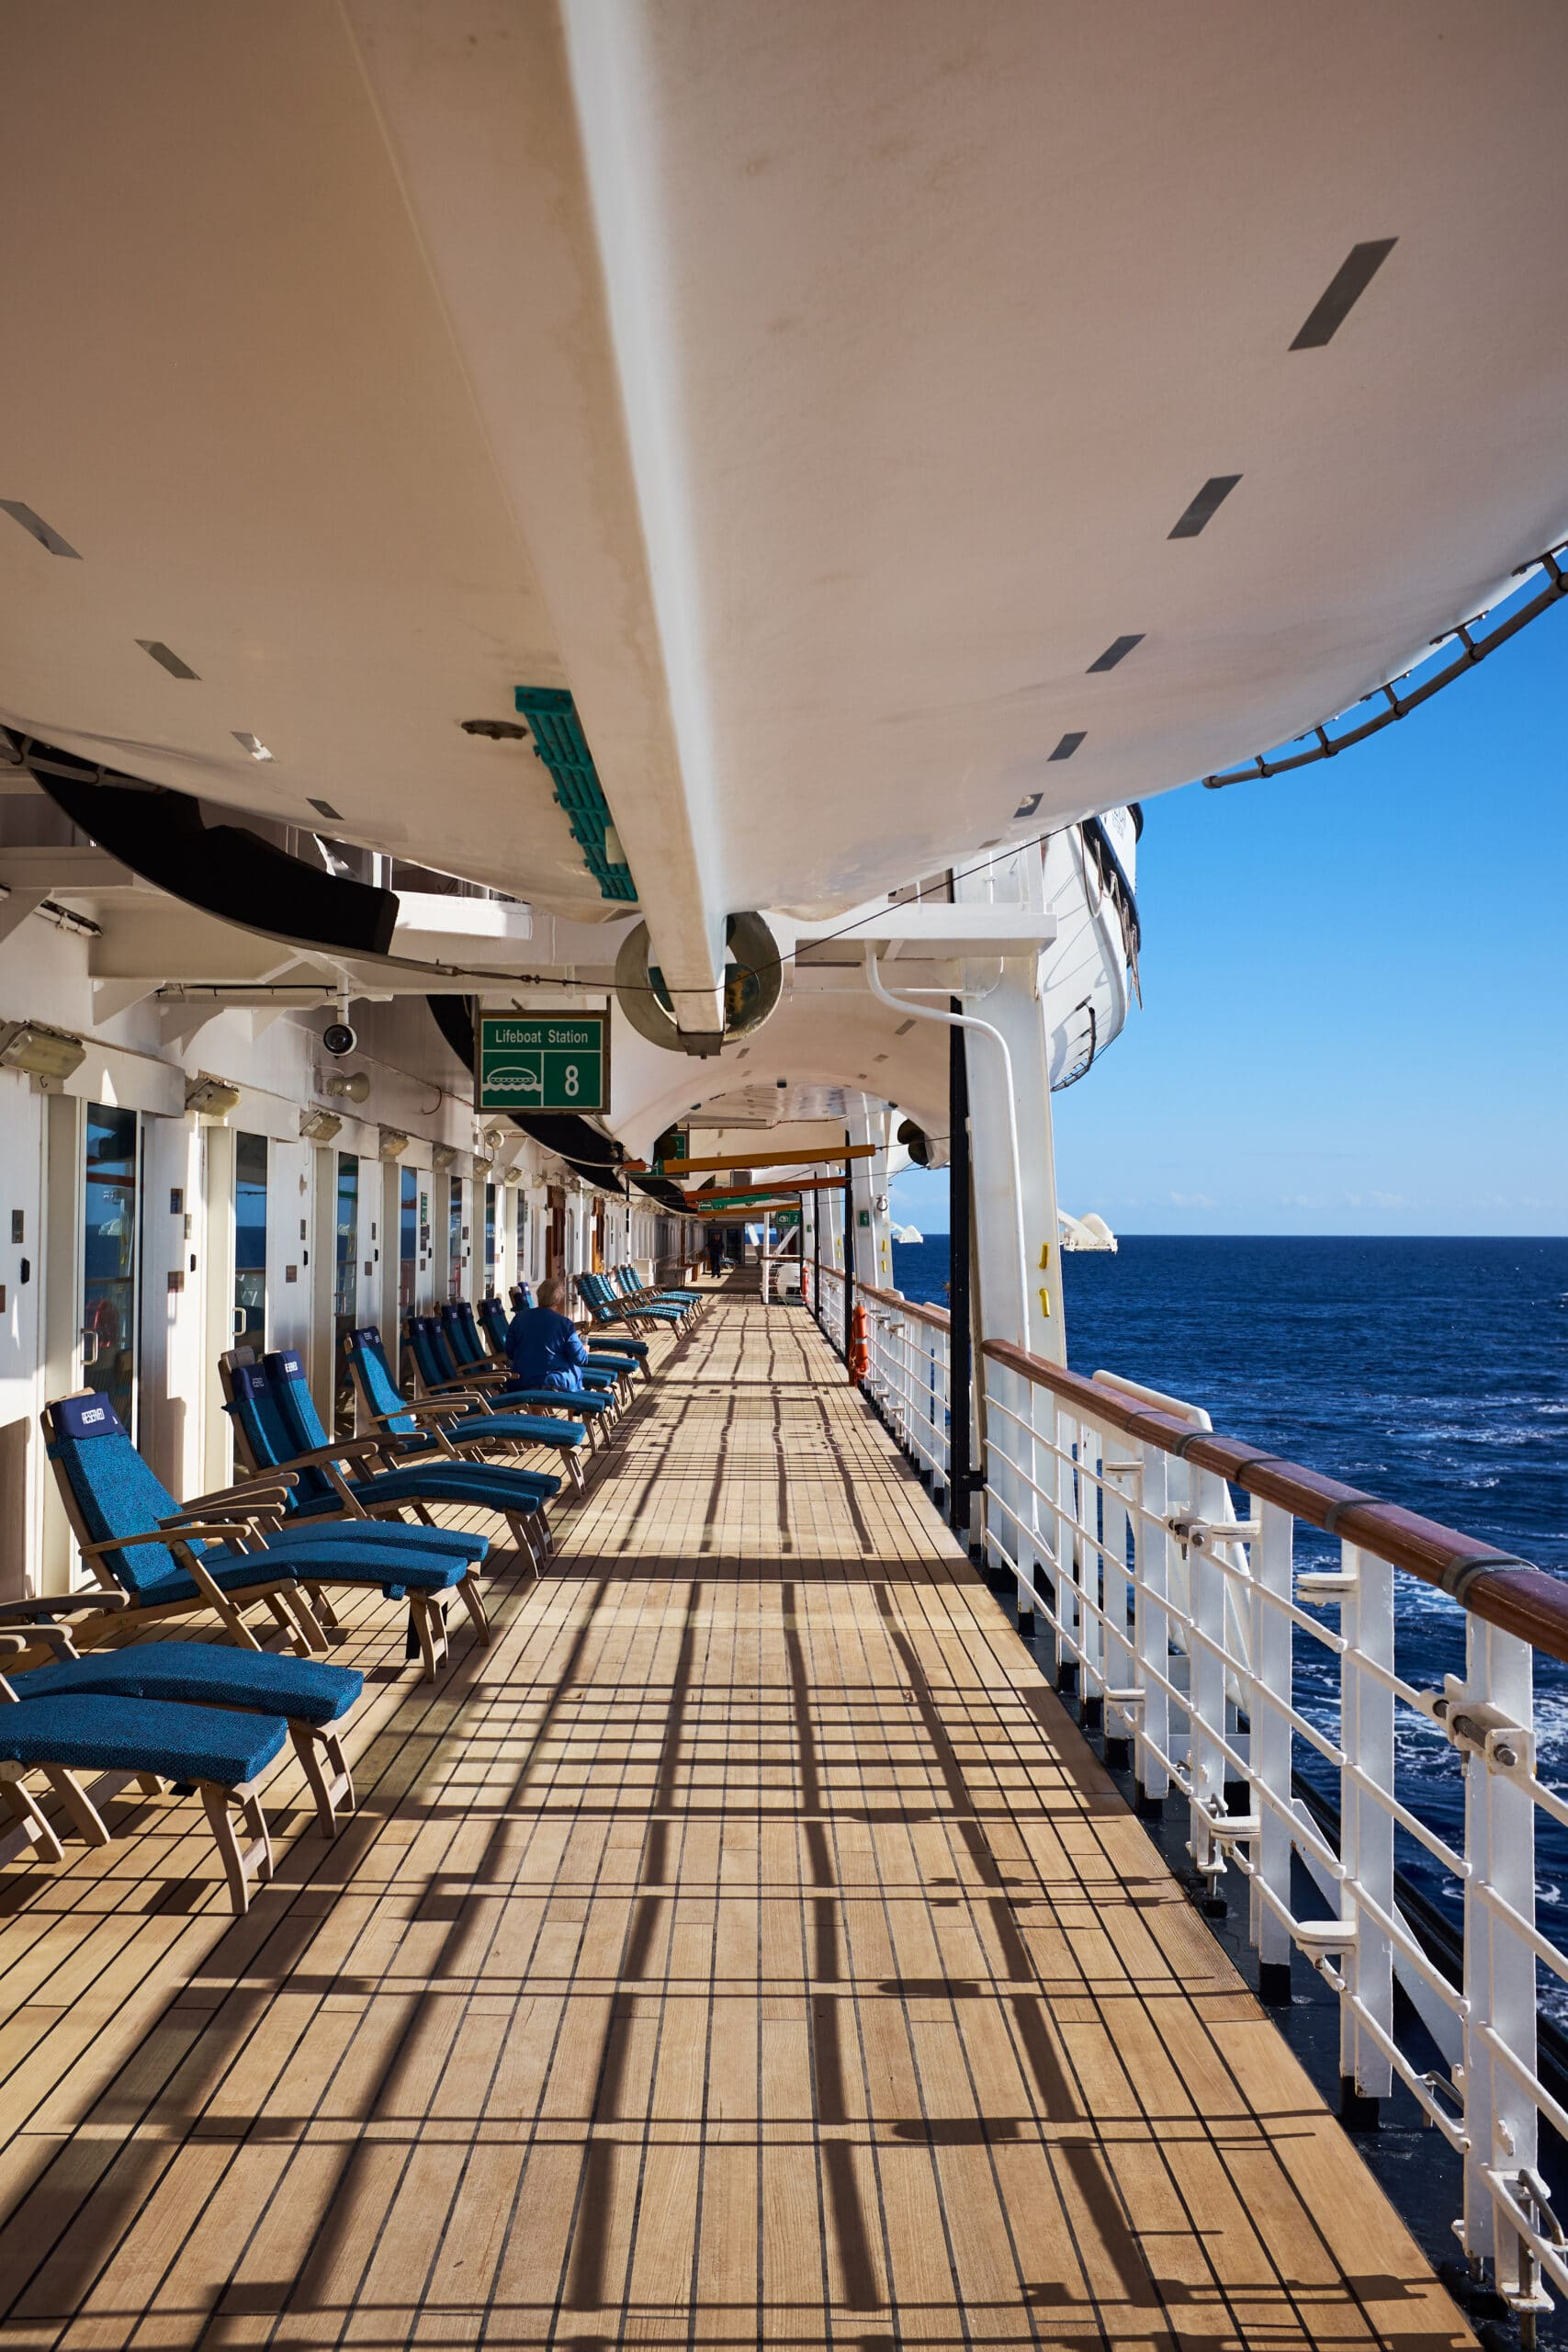 Volendam-Holland America Line-Cruiseschip